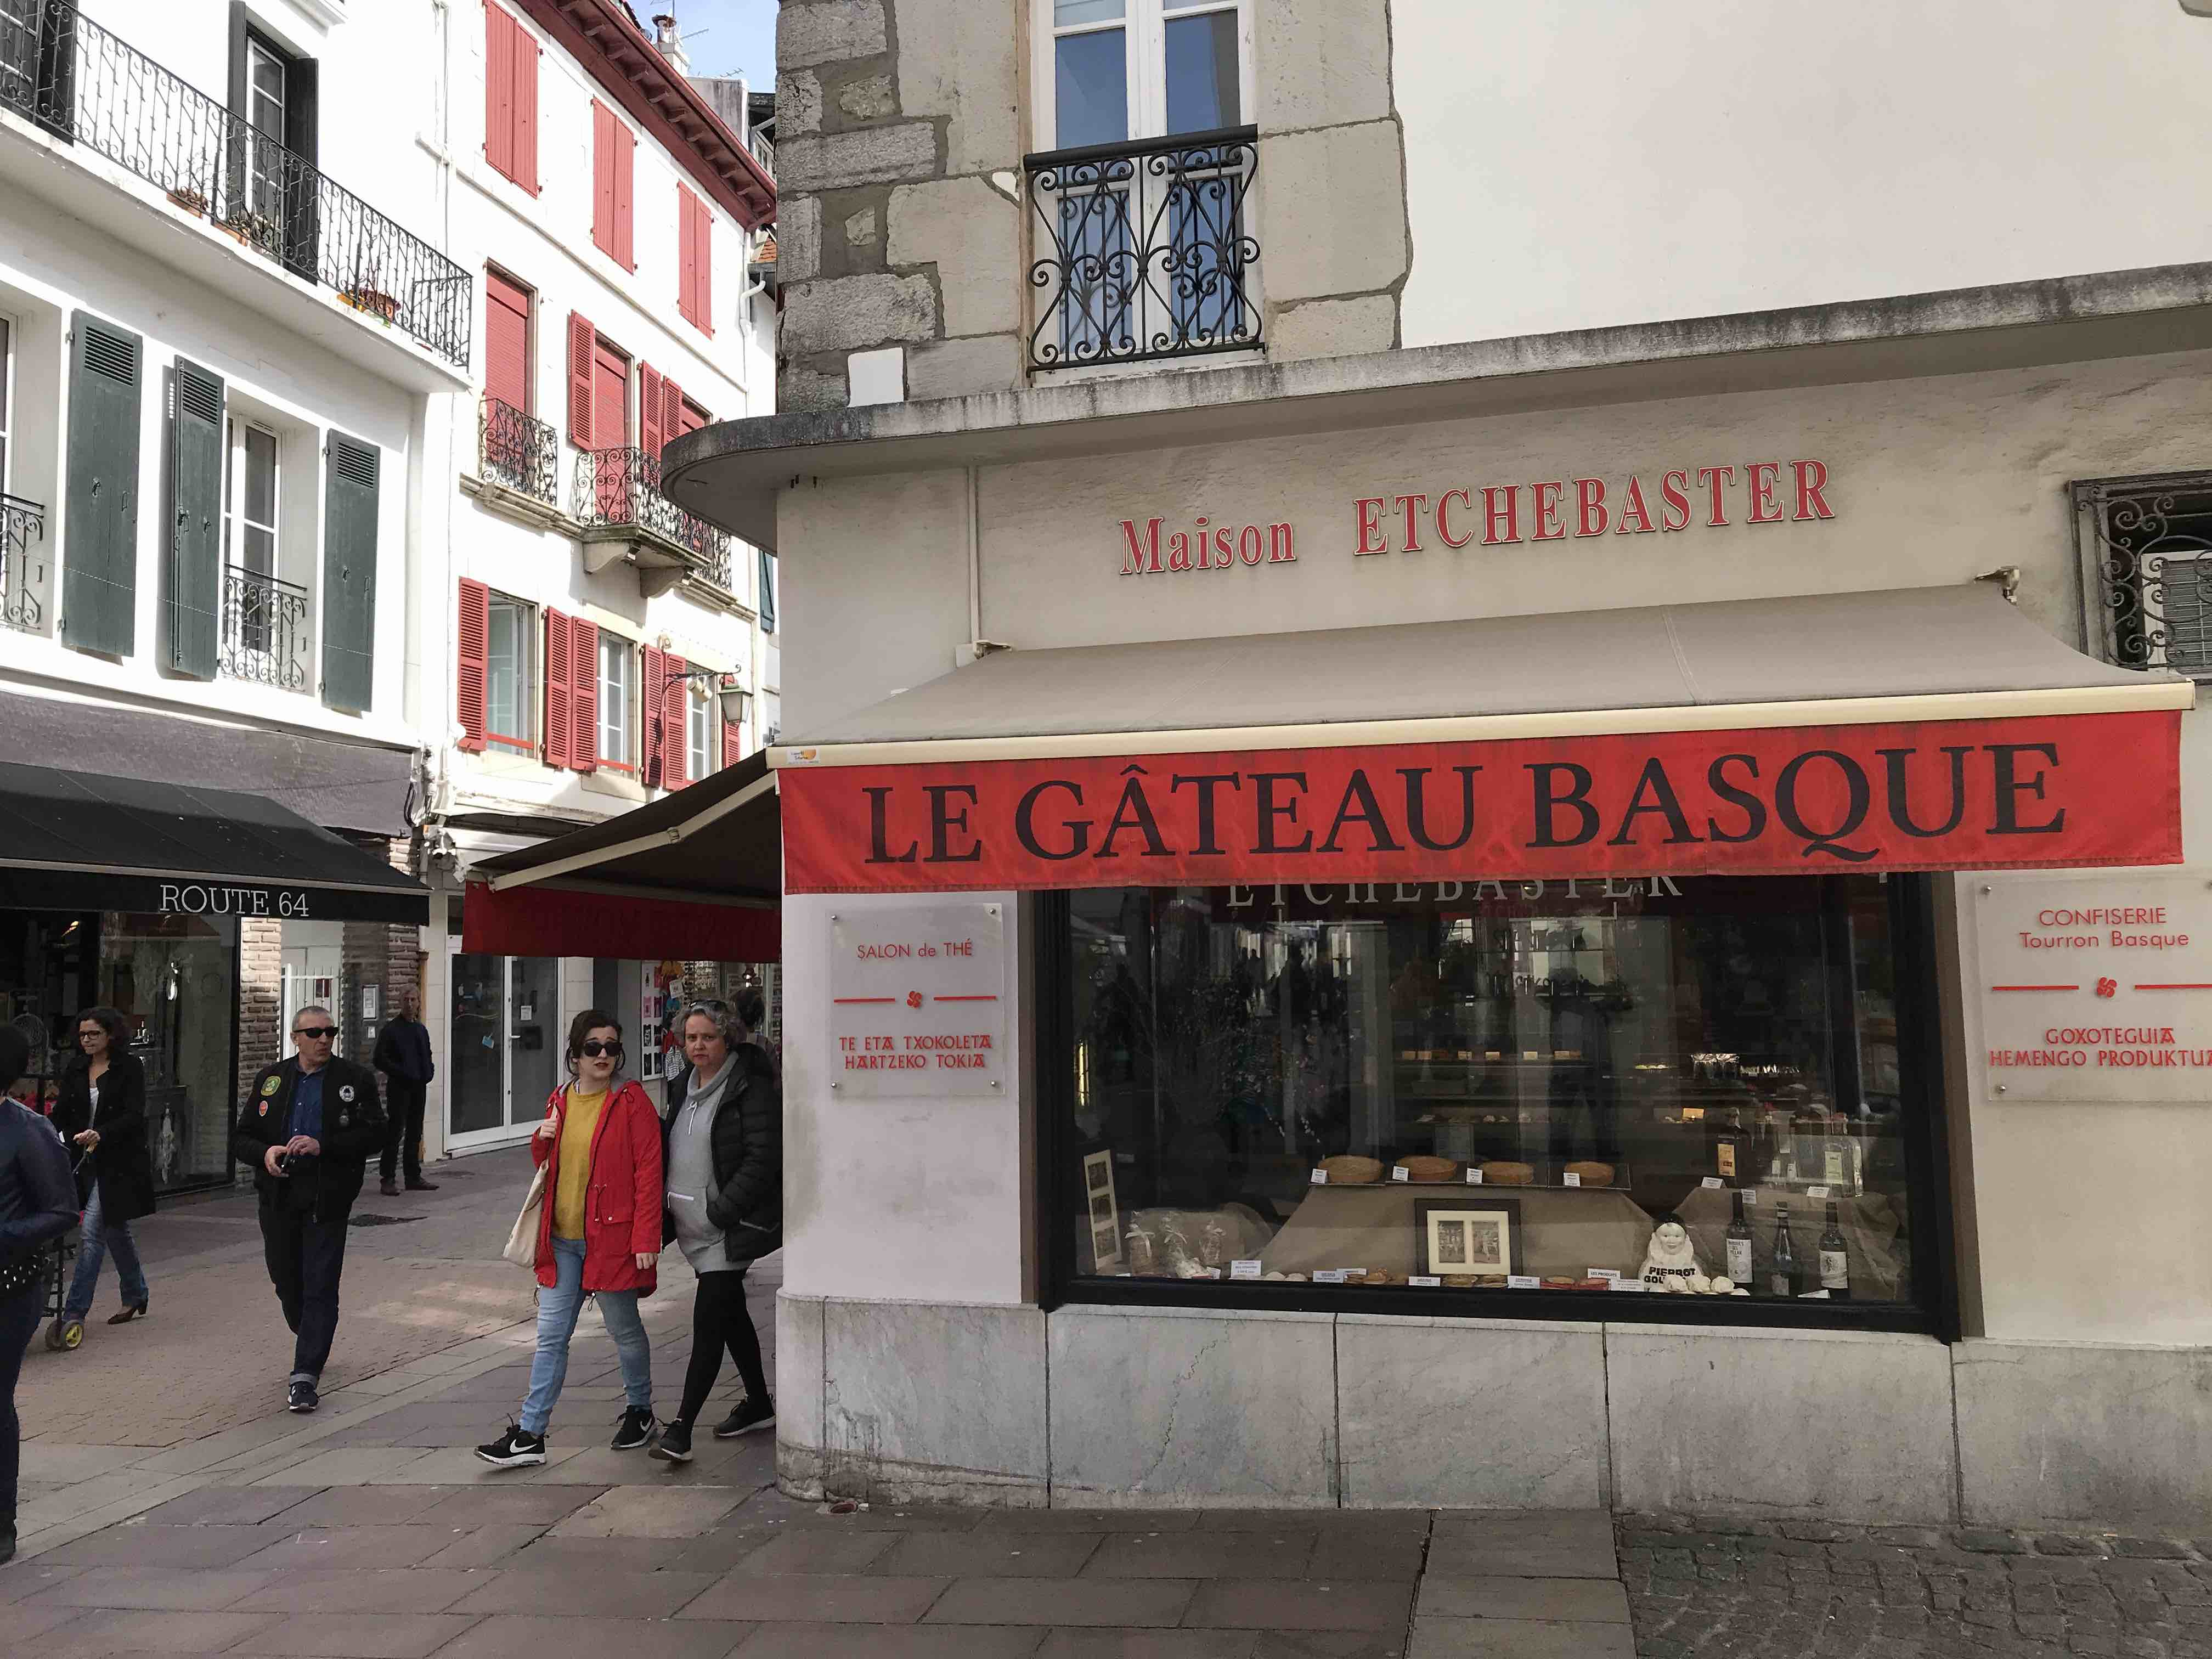 gateau Basque in saint jean de luz